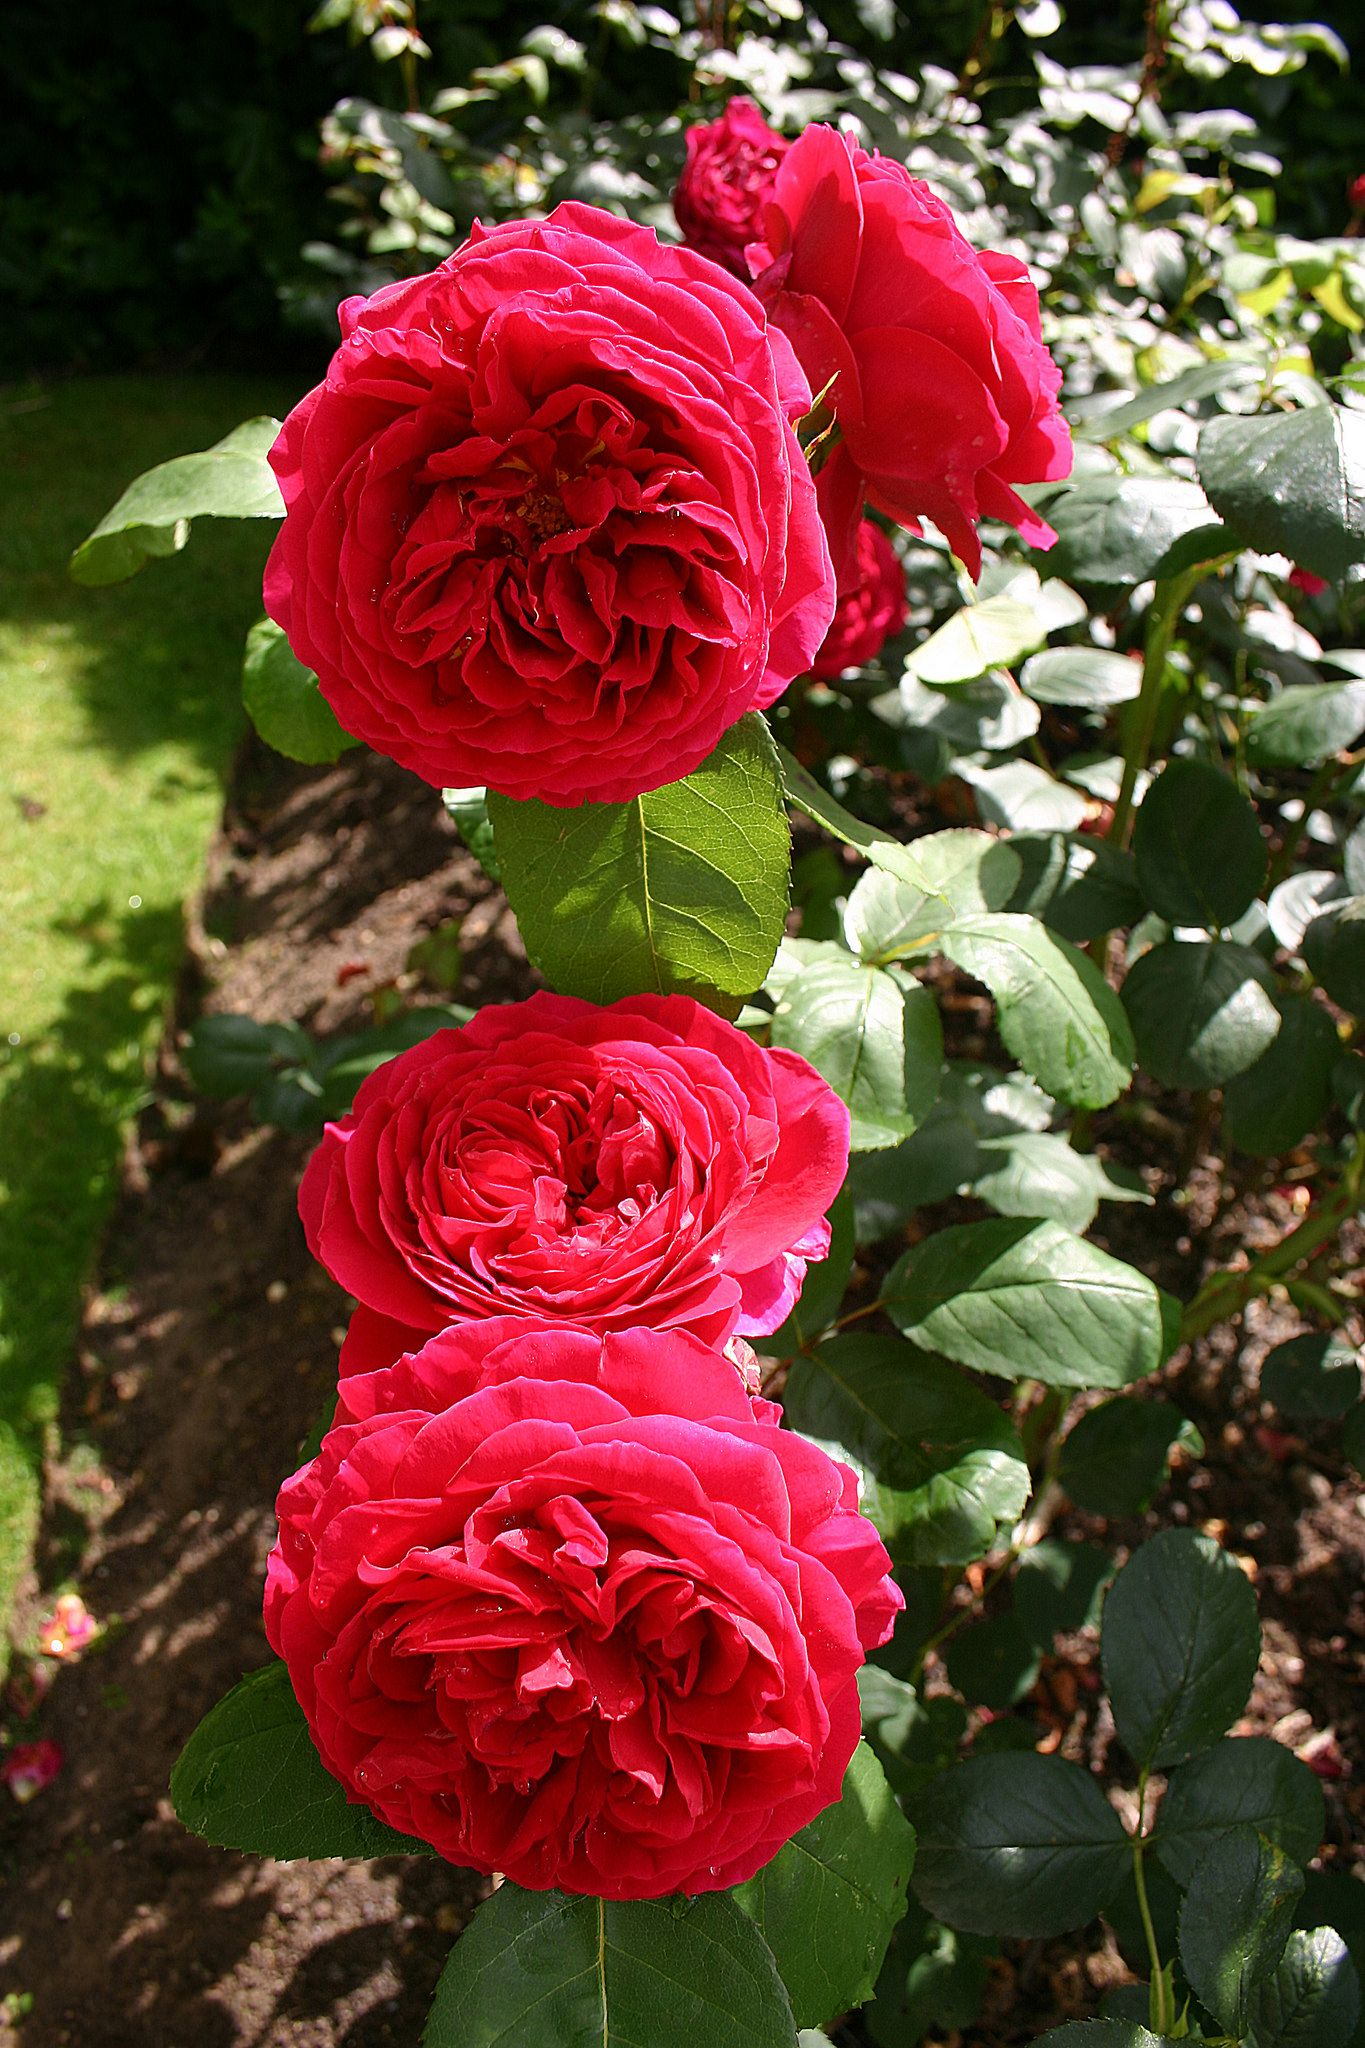 'Heathcliff' | Shrub. English Rose Collection. David C. H. Austin, 2012 | Flickr - © Angelina Moser